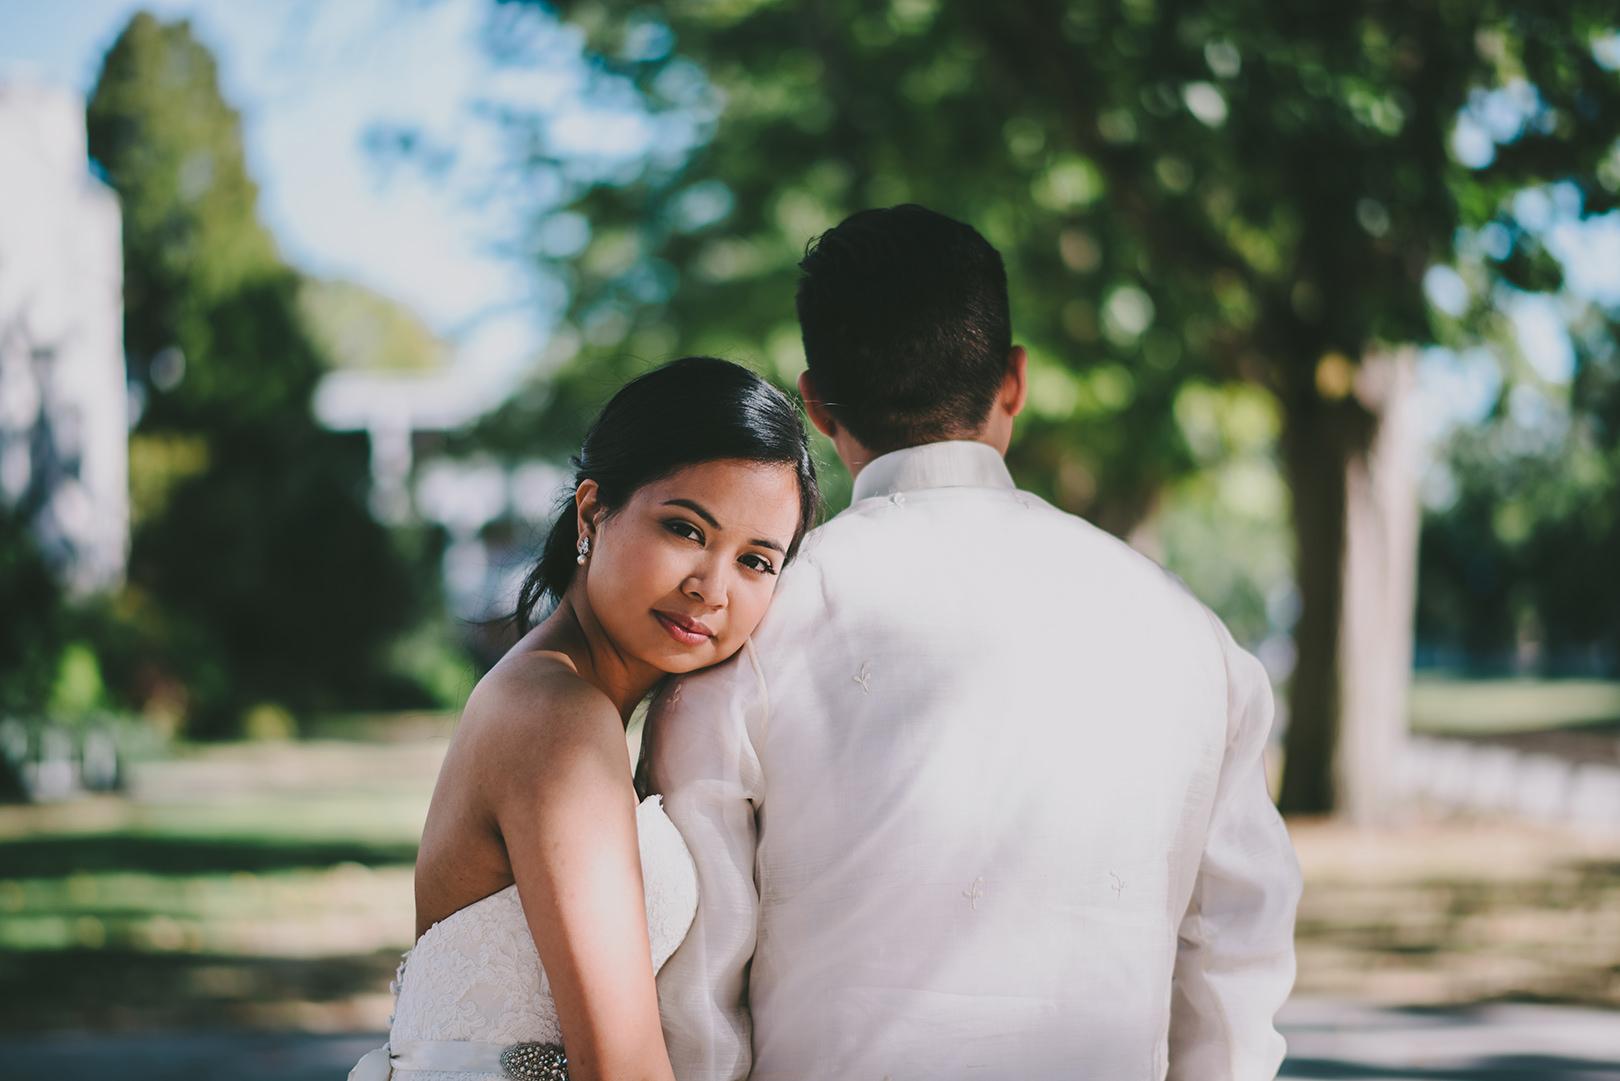 Spain Wedding Photographer - © Dallas Kolotylo Photography - 102